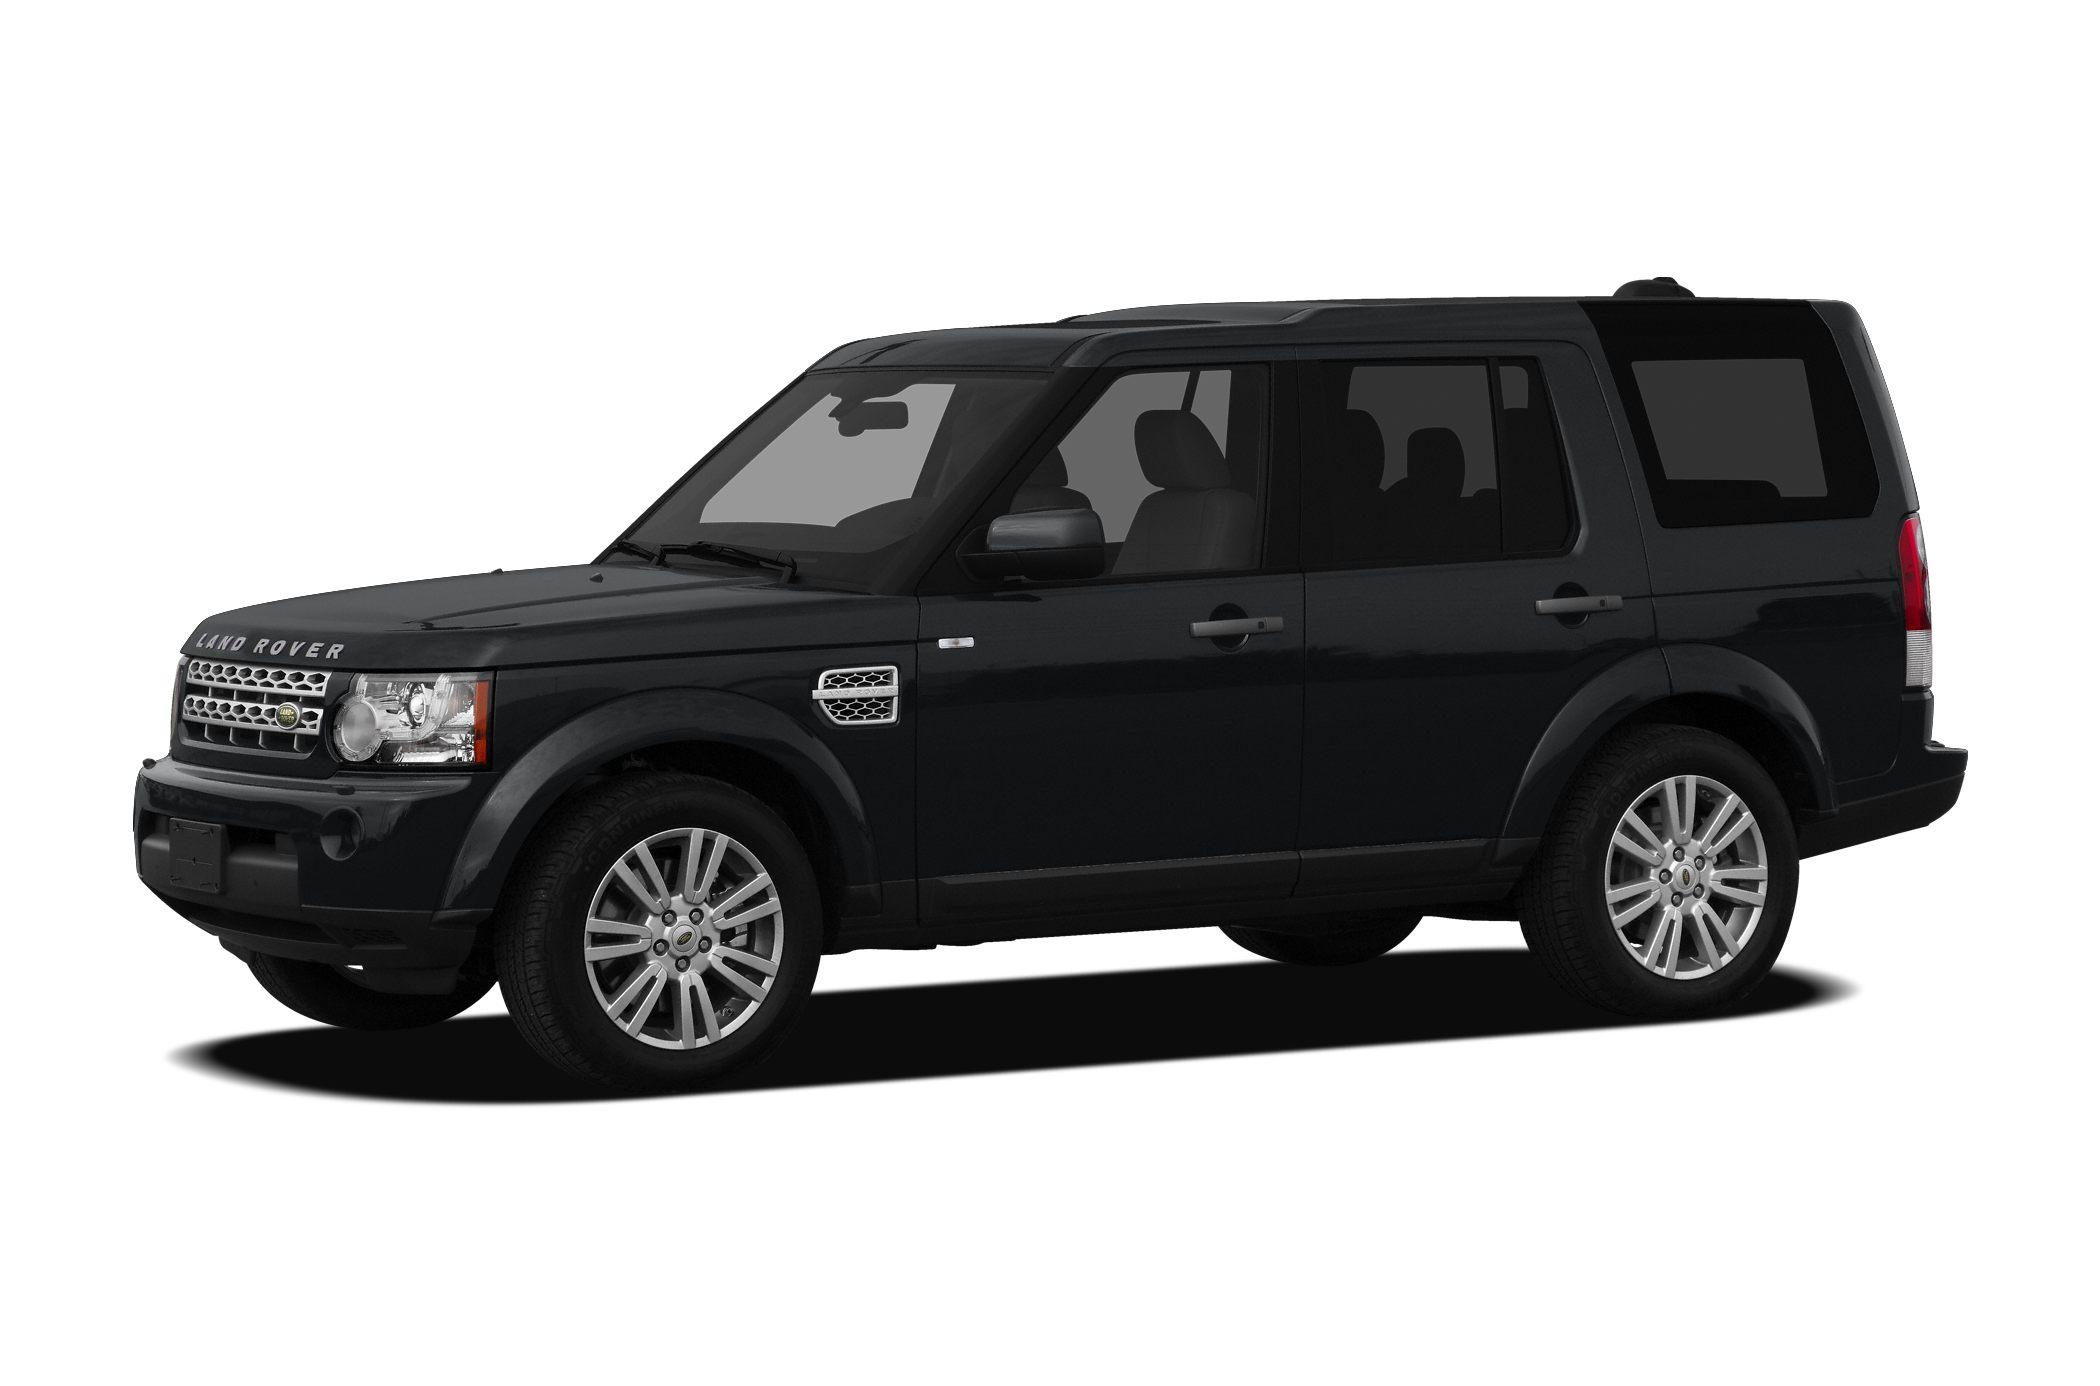 Land Rover Car Reviews & Ratings